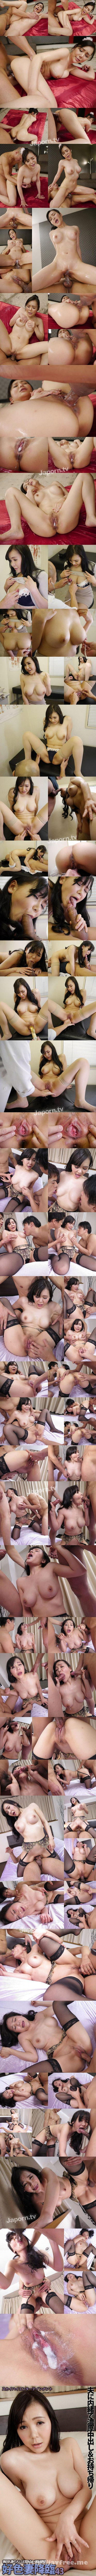 [SKY 288] 好色妻降臨 Vol.43 : 渡辺美羽 渡辺美羽 好色妻降臨 SKY Miu Watanabe Dirty Minded Wife Advent